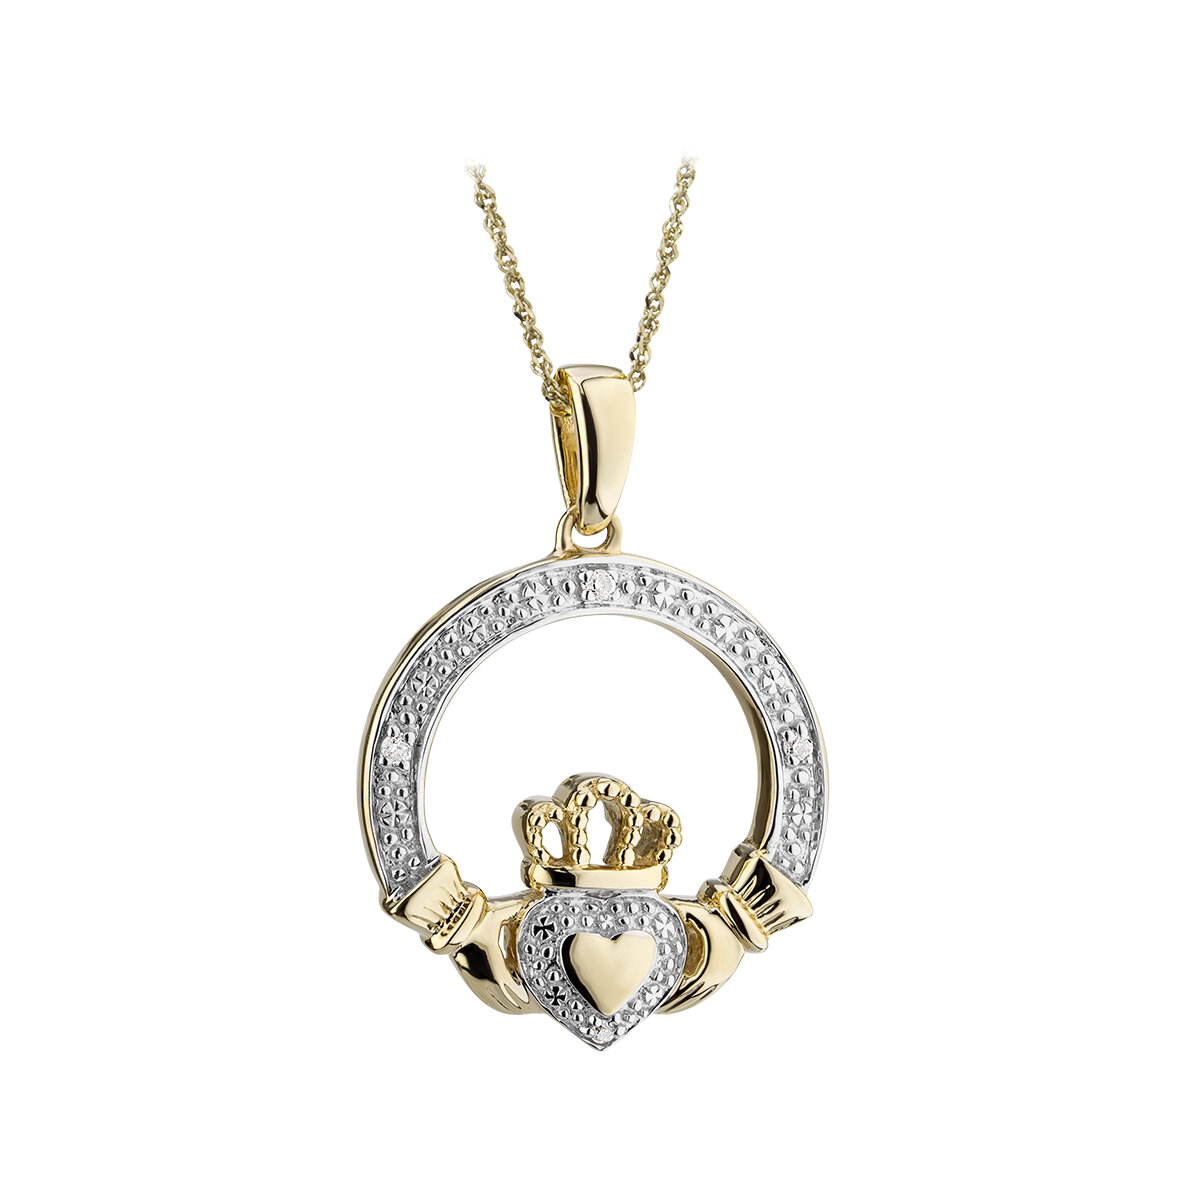 10k gold diamond claddagh pendant s46507 from Solvar